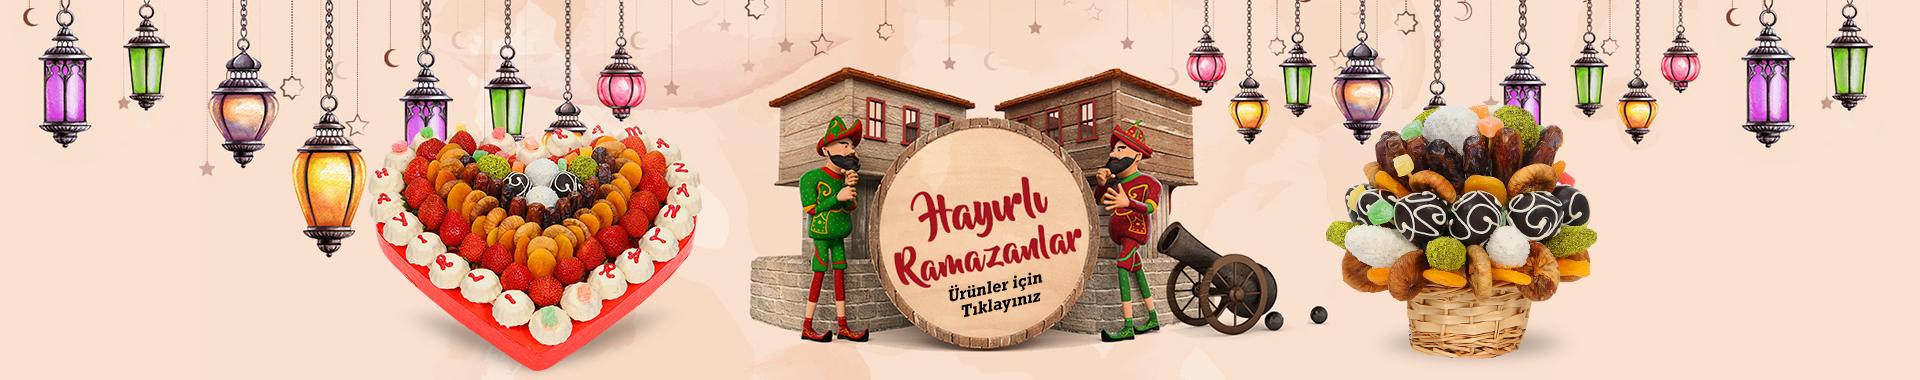 ramazan 2019